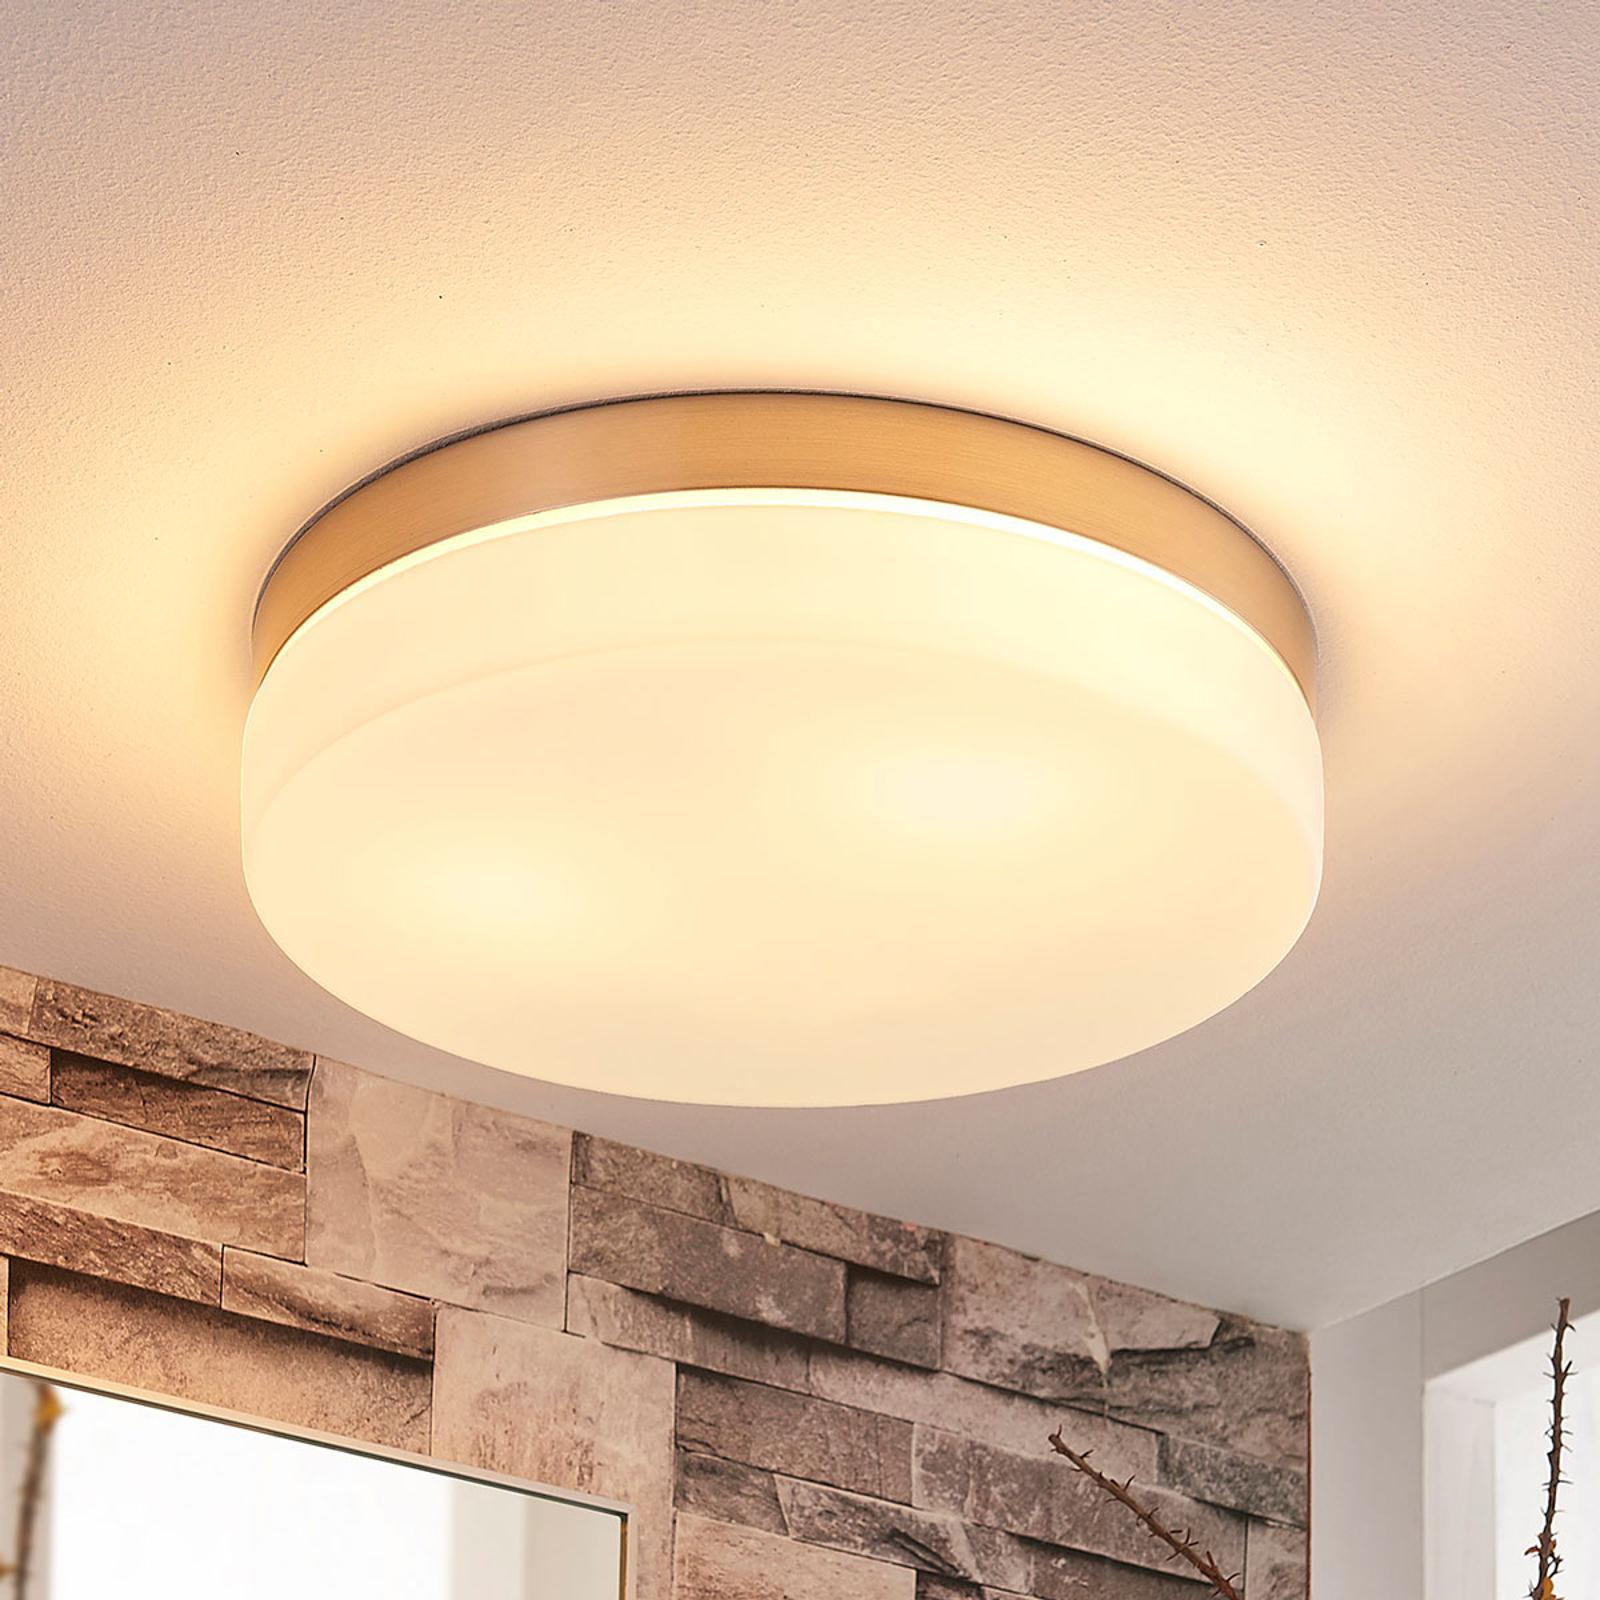 Witte plafondlamp Amilia met nikkel frame, IP44